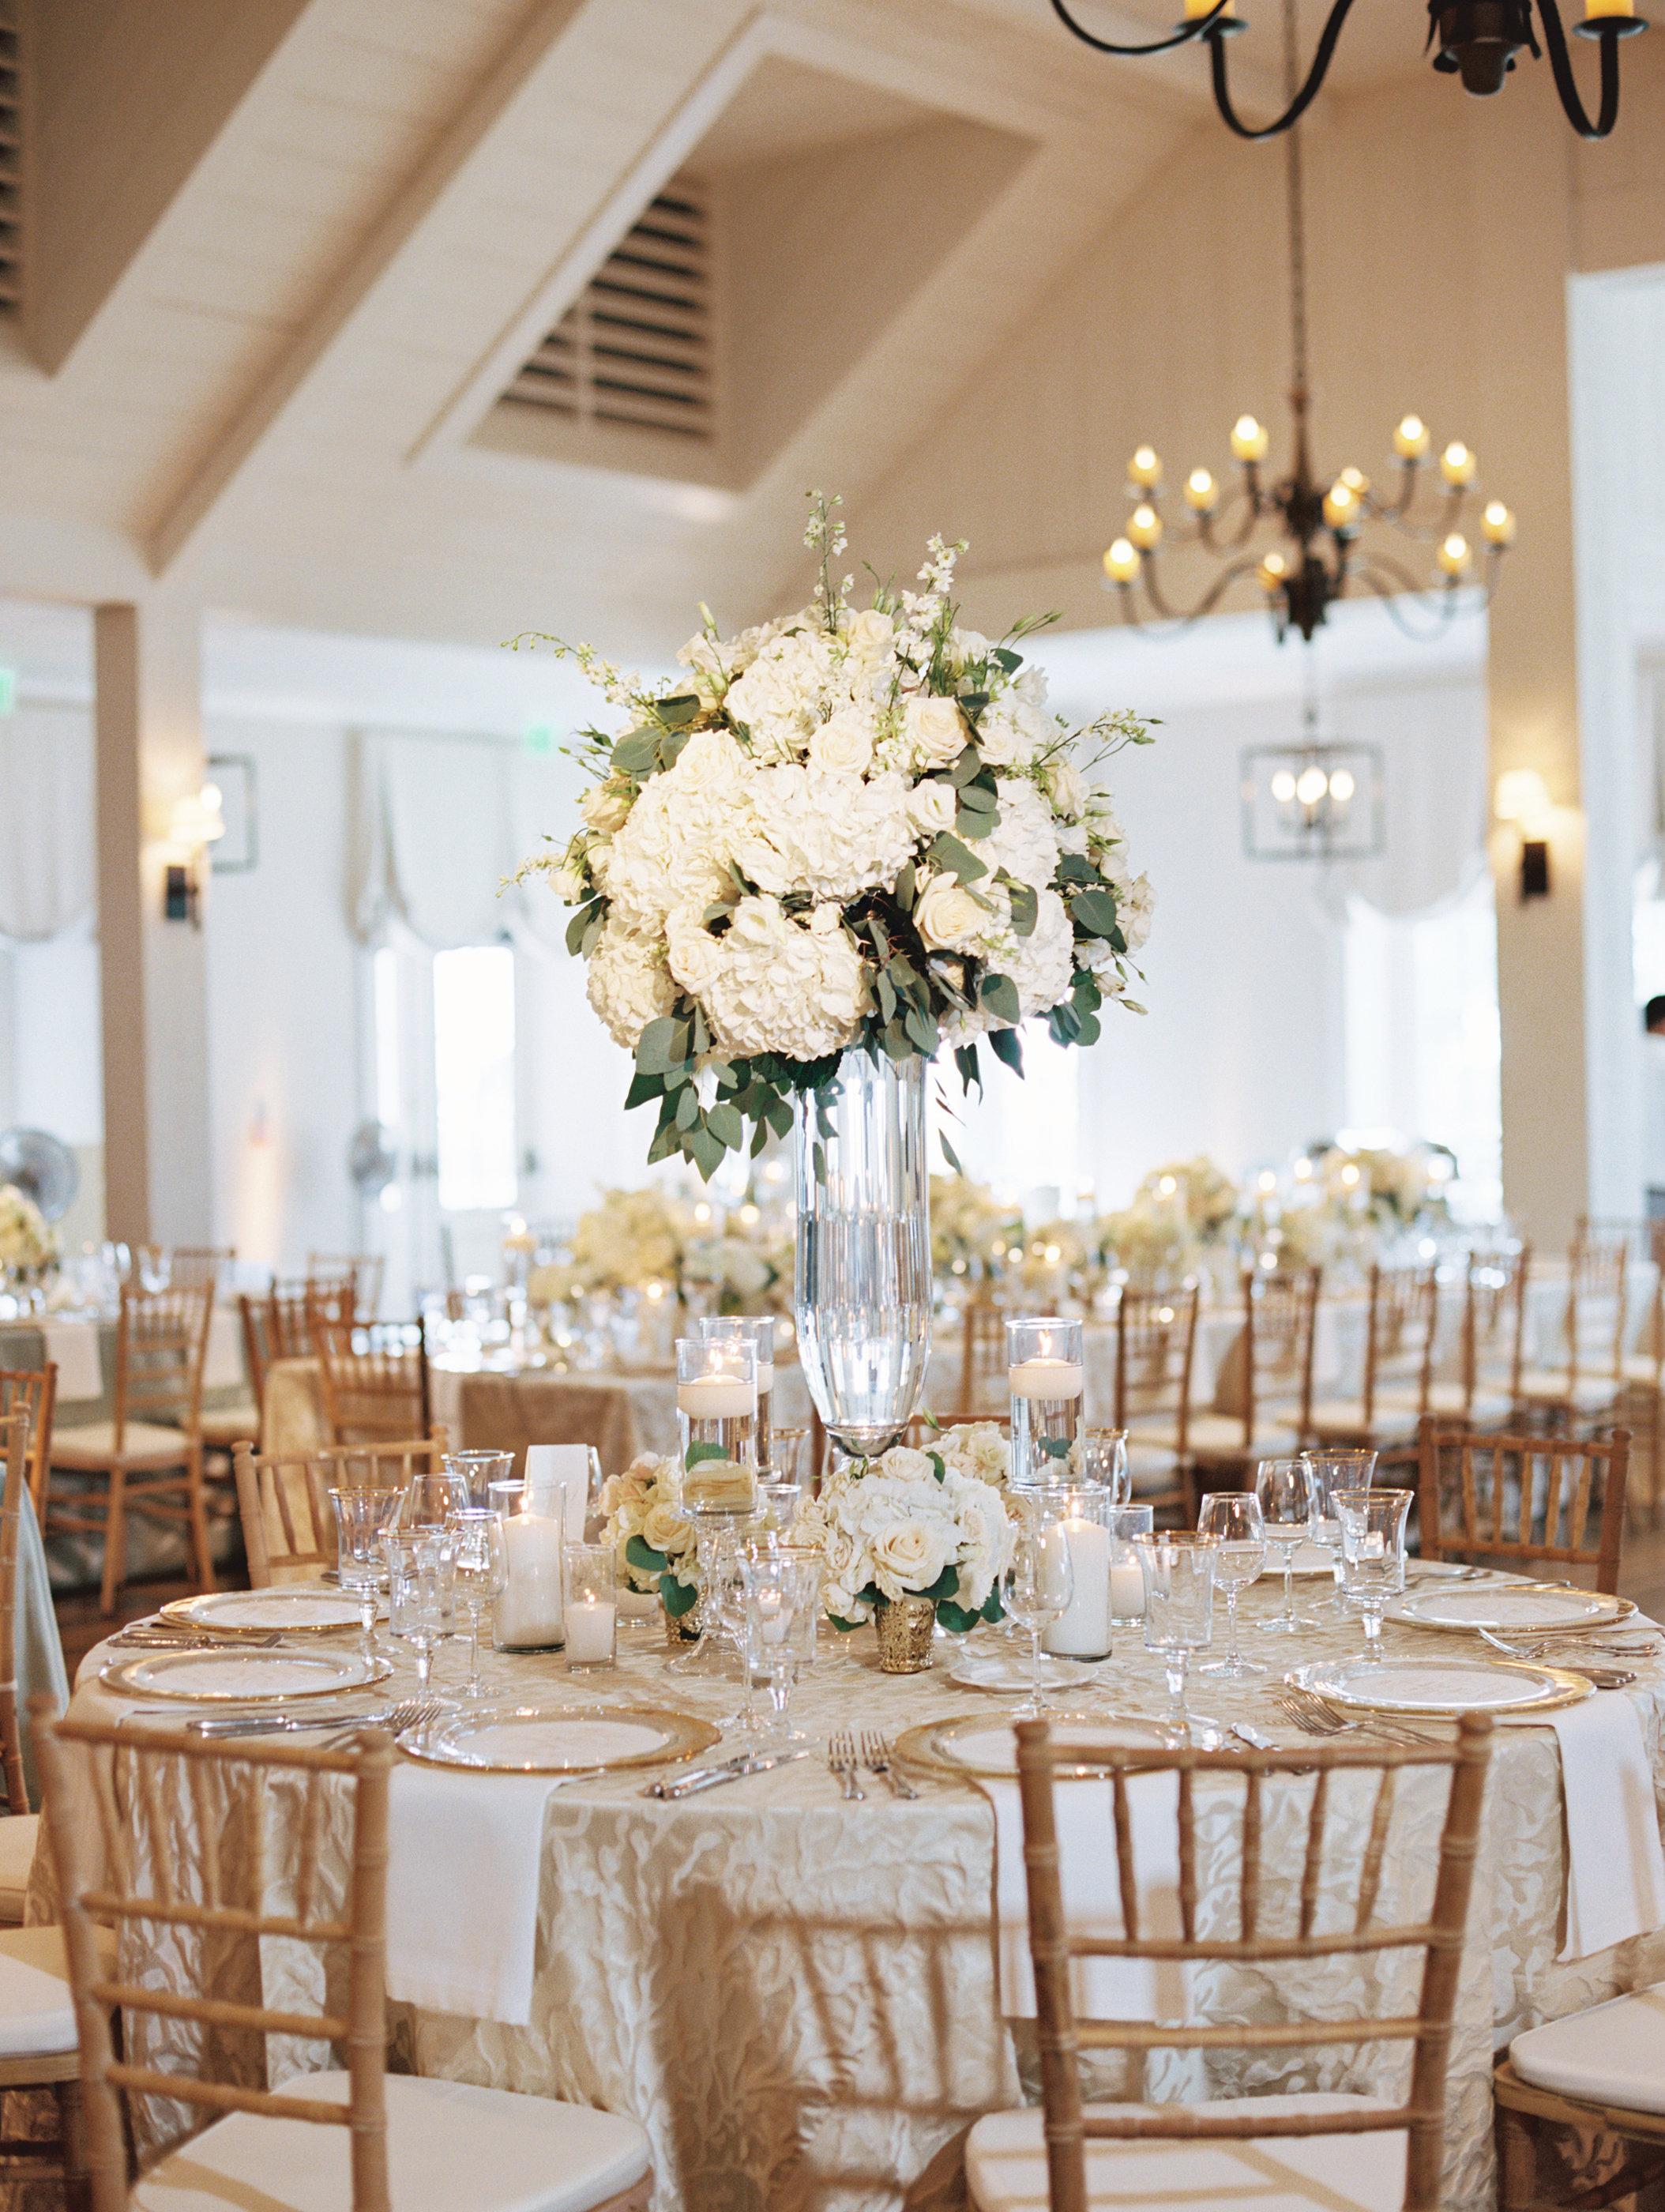 Reception Details - Kiawah Island, South Carolina - Fall Wedding - Julian Leaver Events